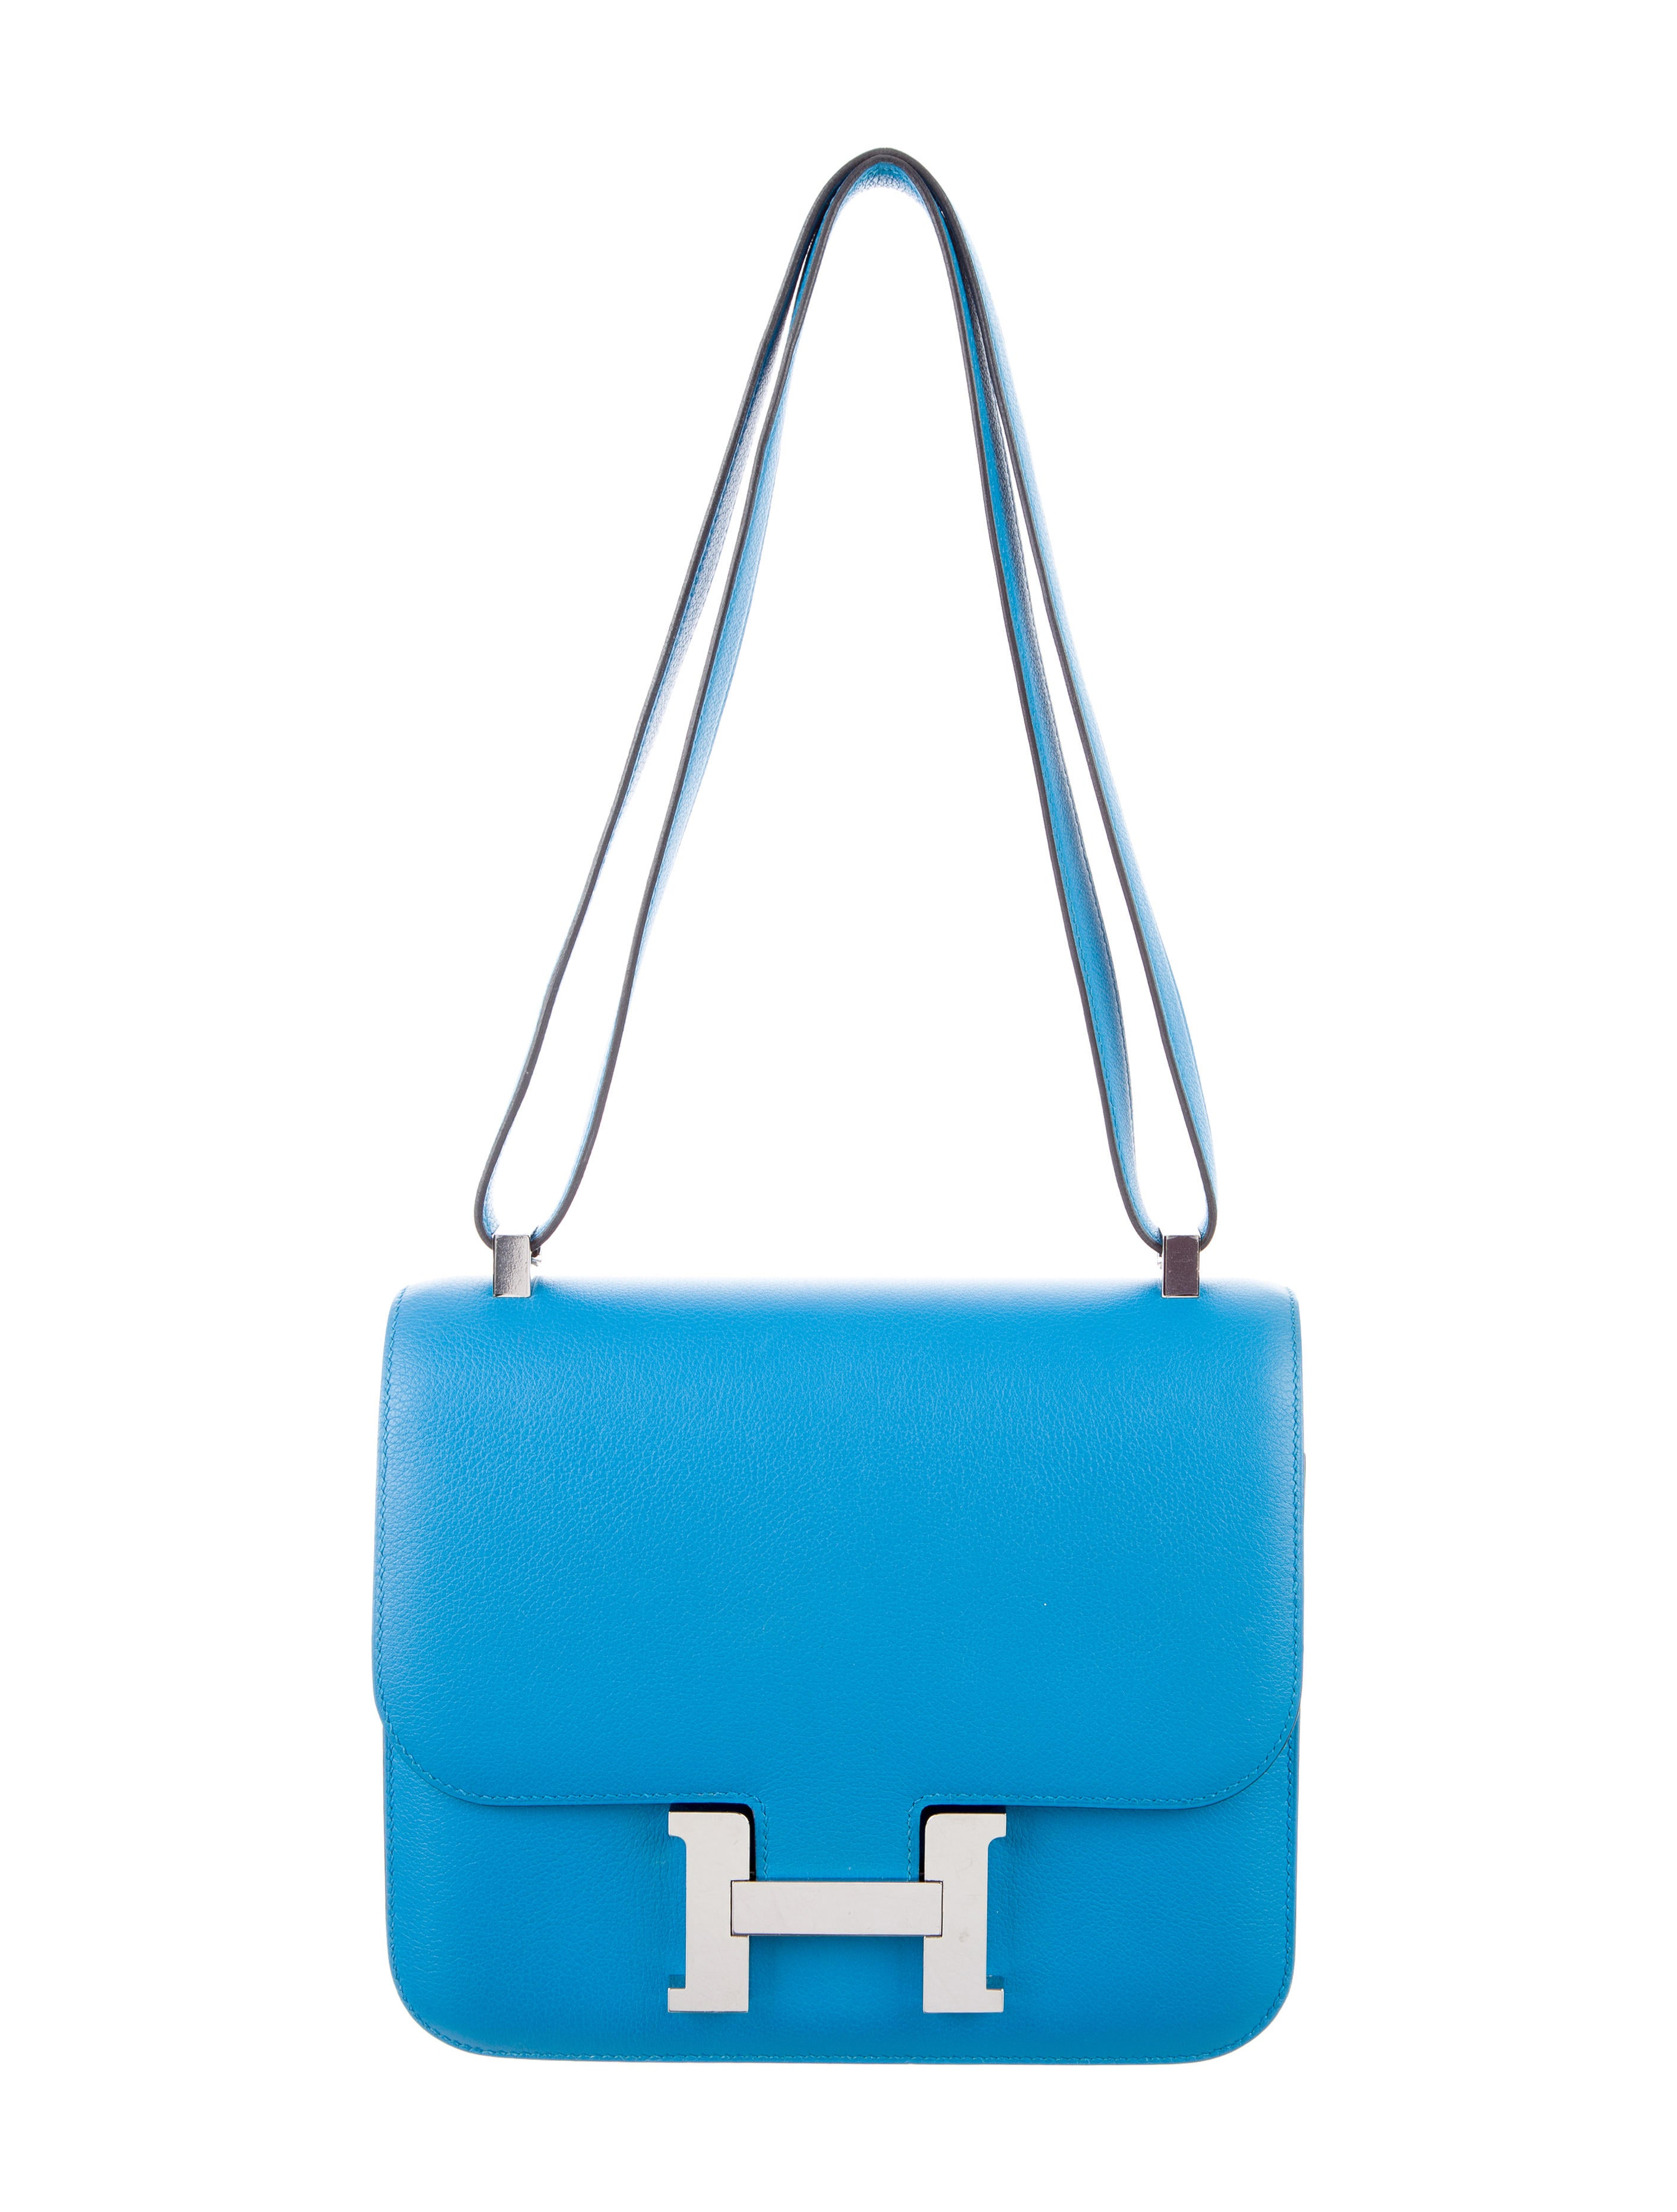 herm s evercolor constance 24 handbags her108899 the realreal. Black Bedroom Furniture Sets. Home Design Ideas